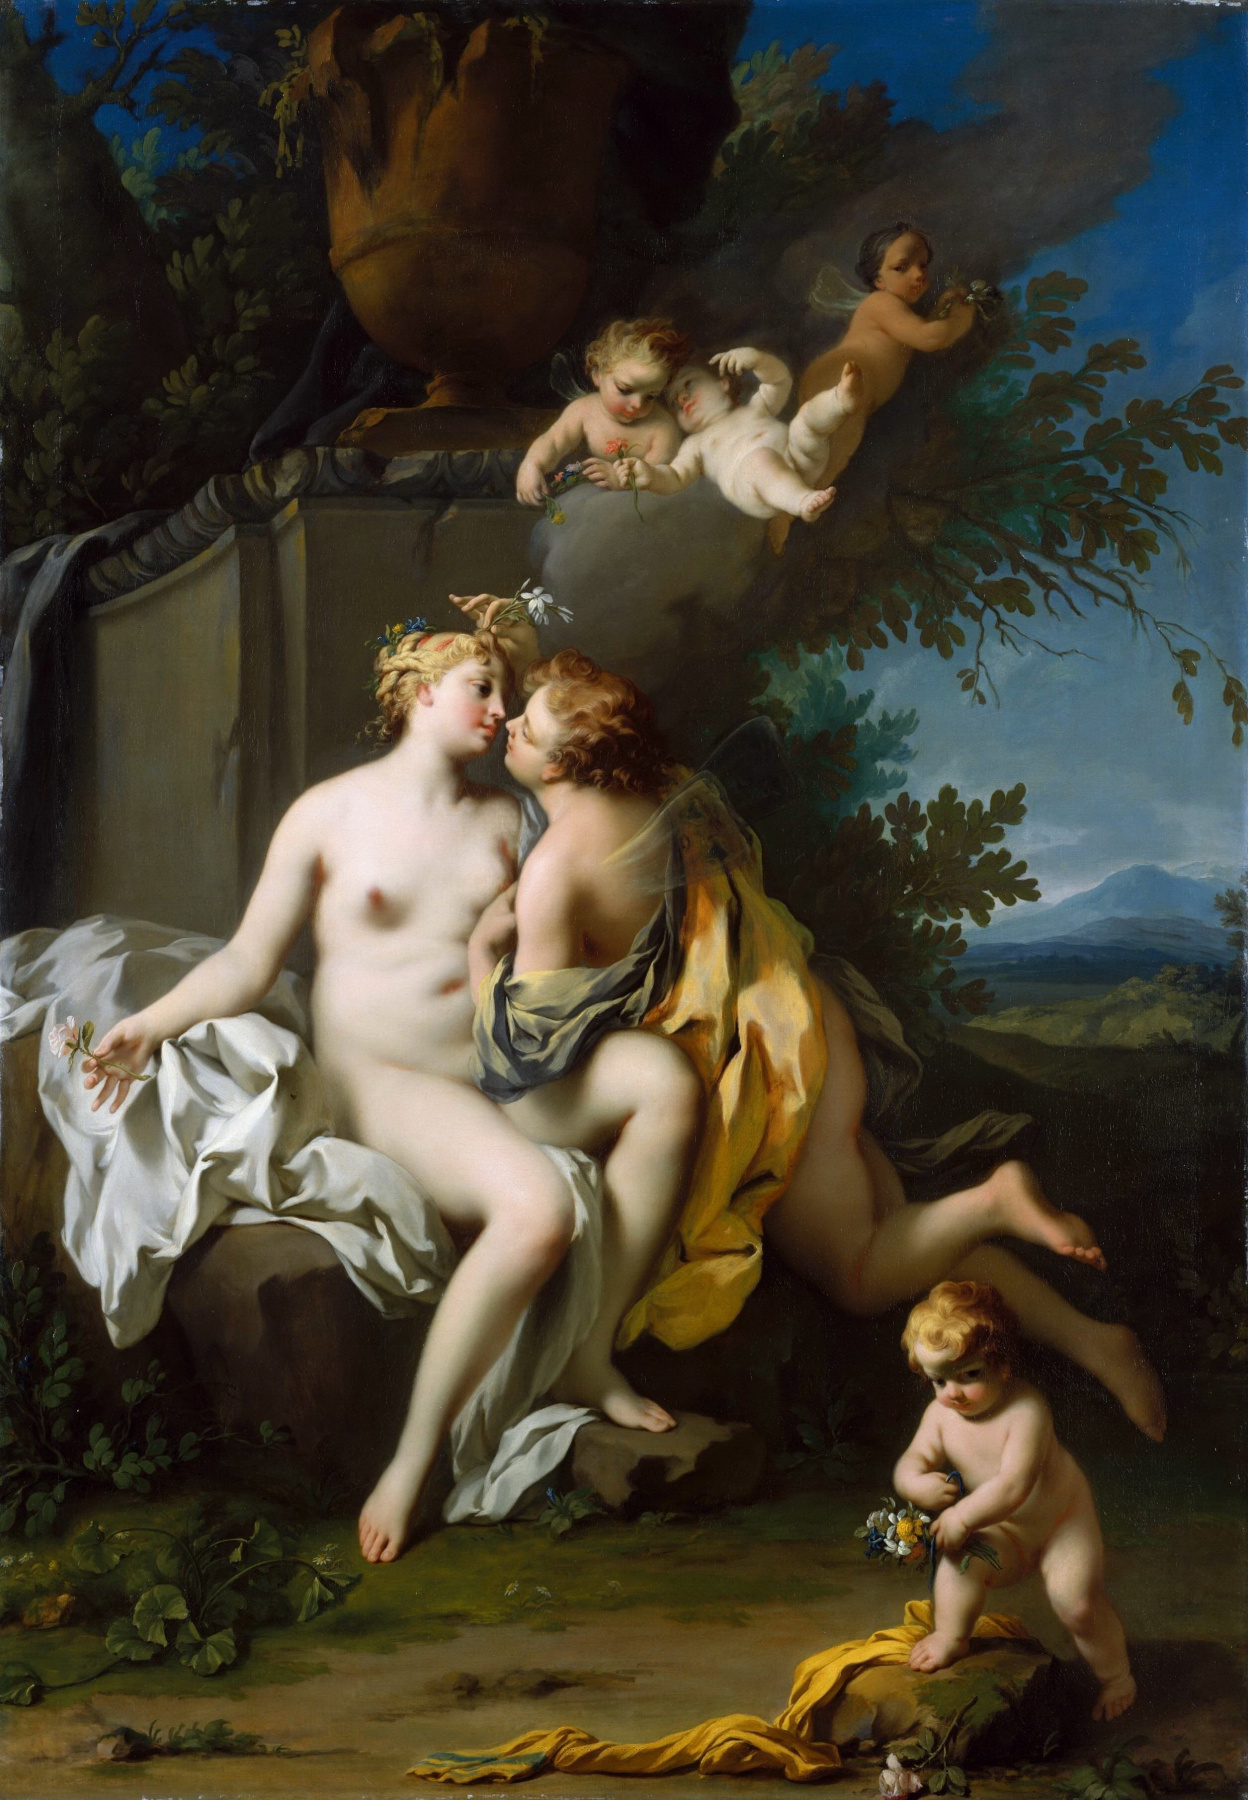 Jacopo Amigoni. Flora and Zephyr